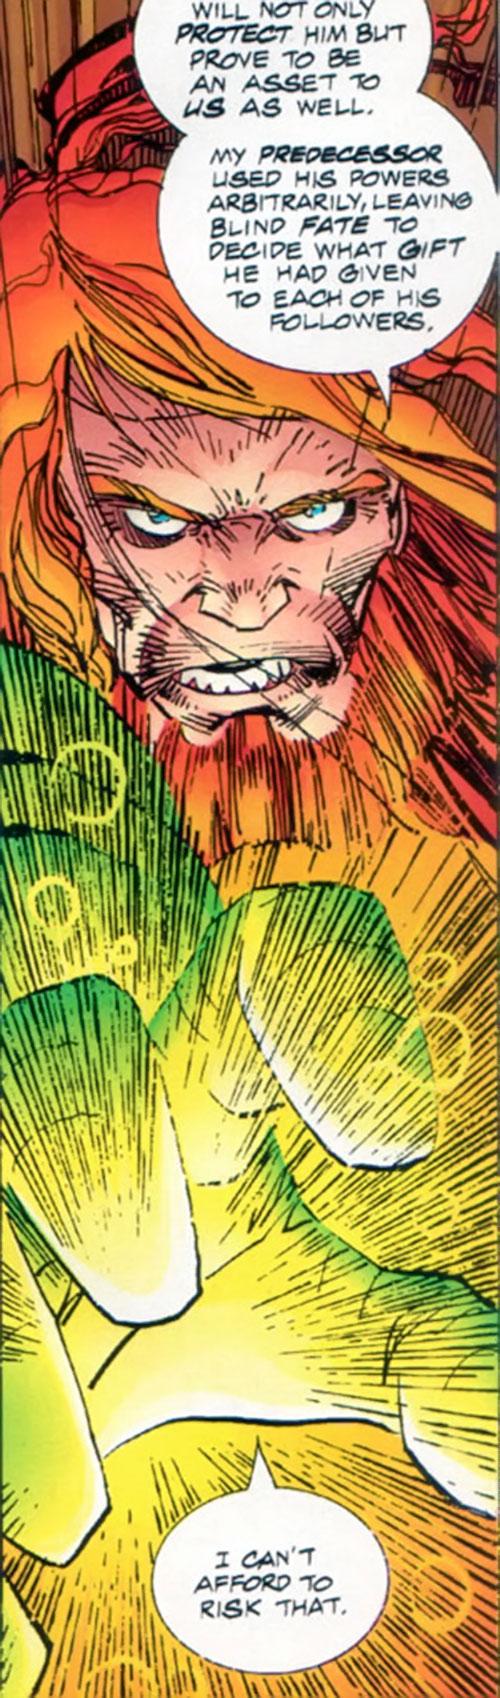 Johnny Redbeard (Savage Dragon Comics) with his hand glowing